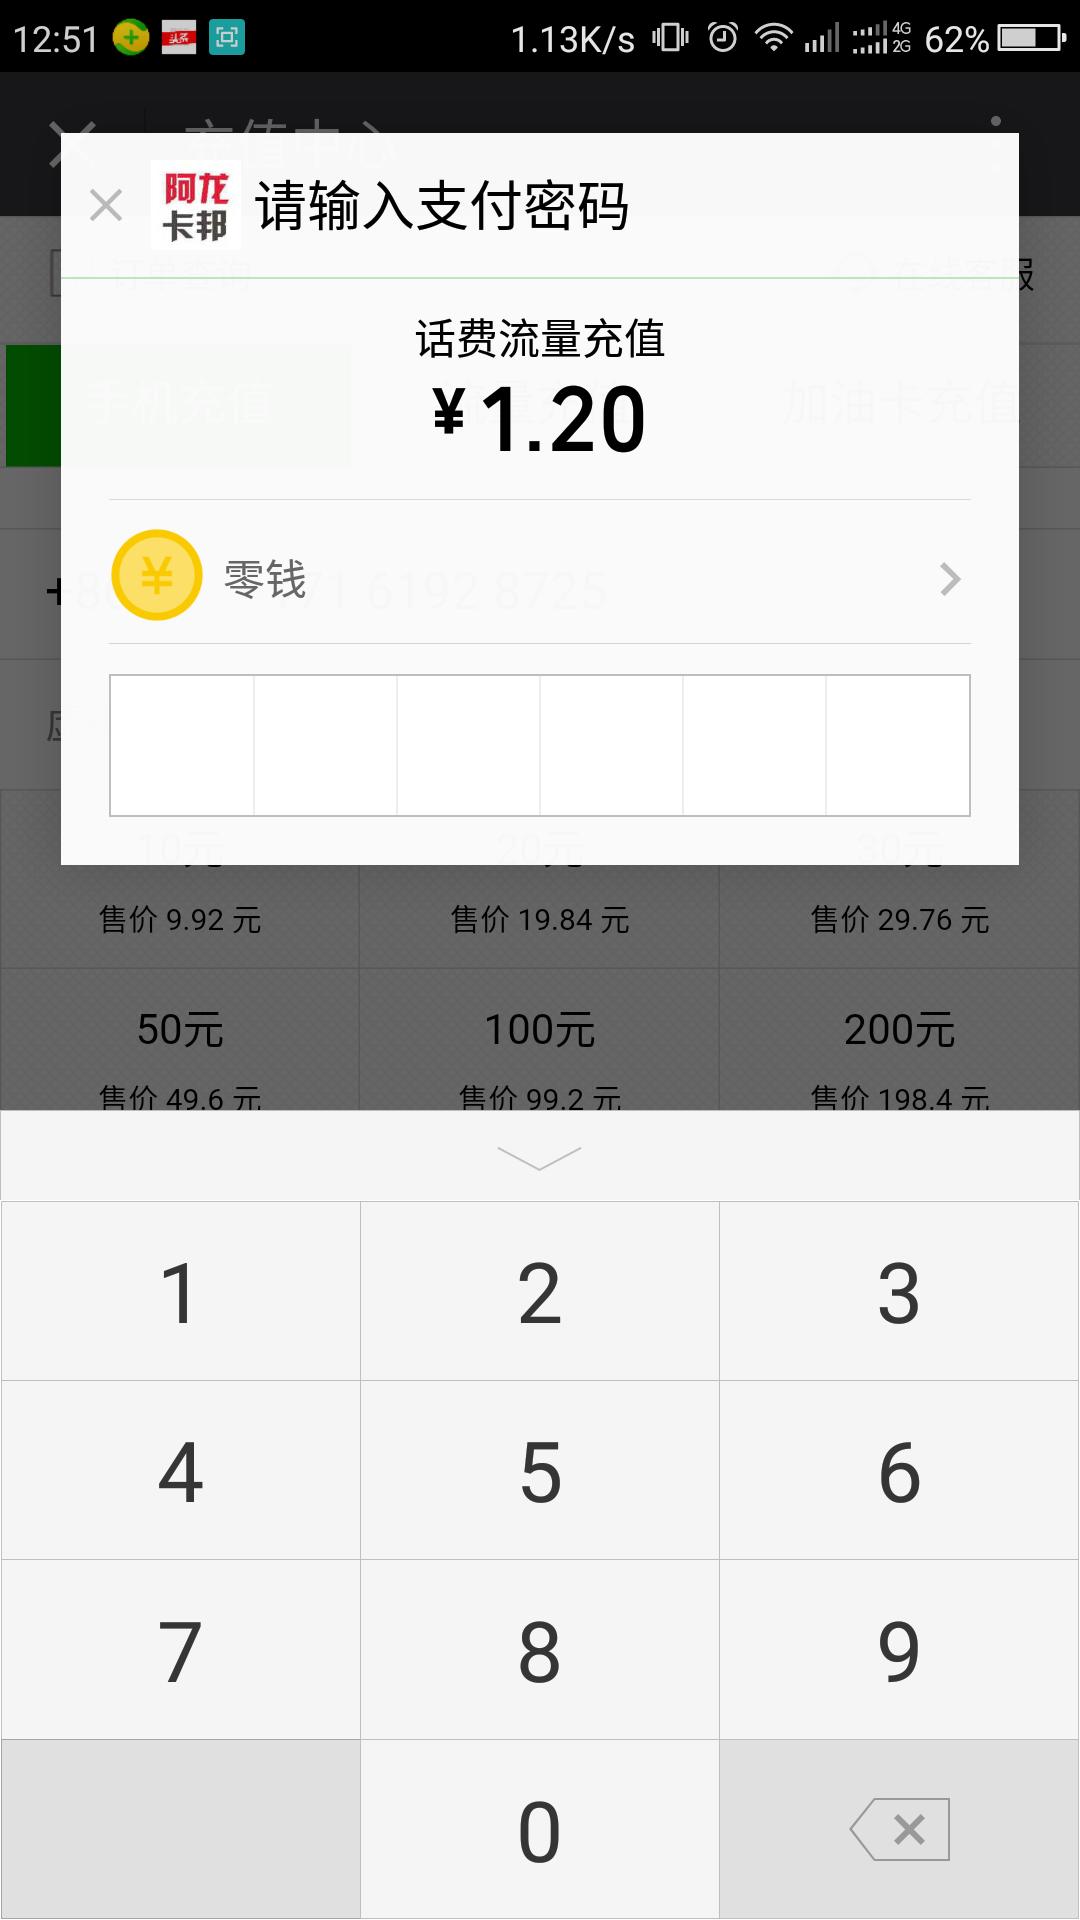 U友170/171手机卡怎么缴费充值?